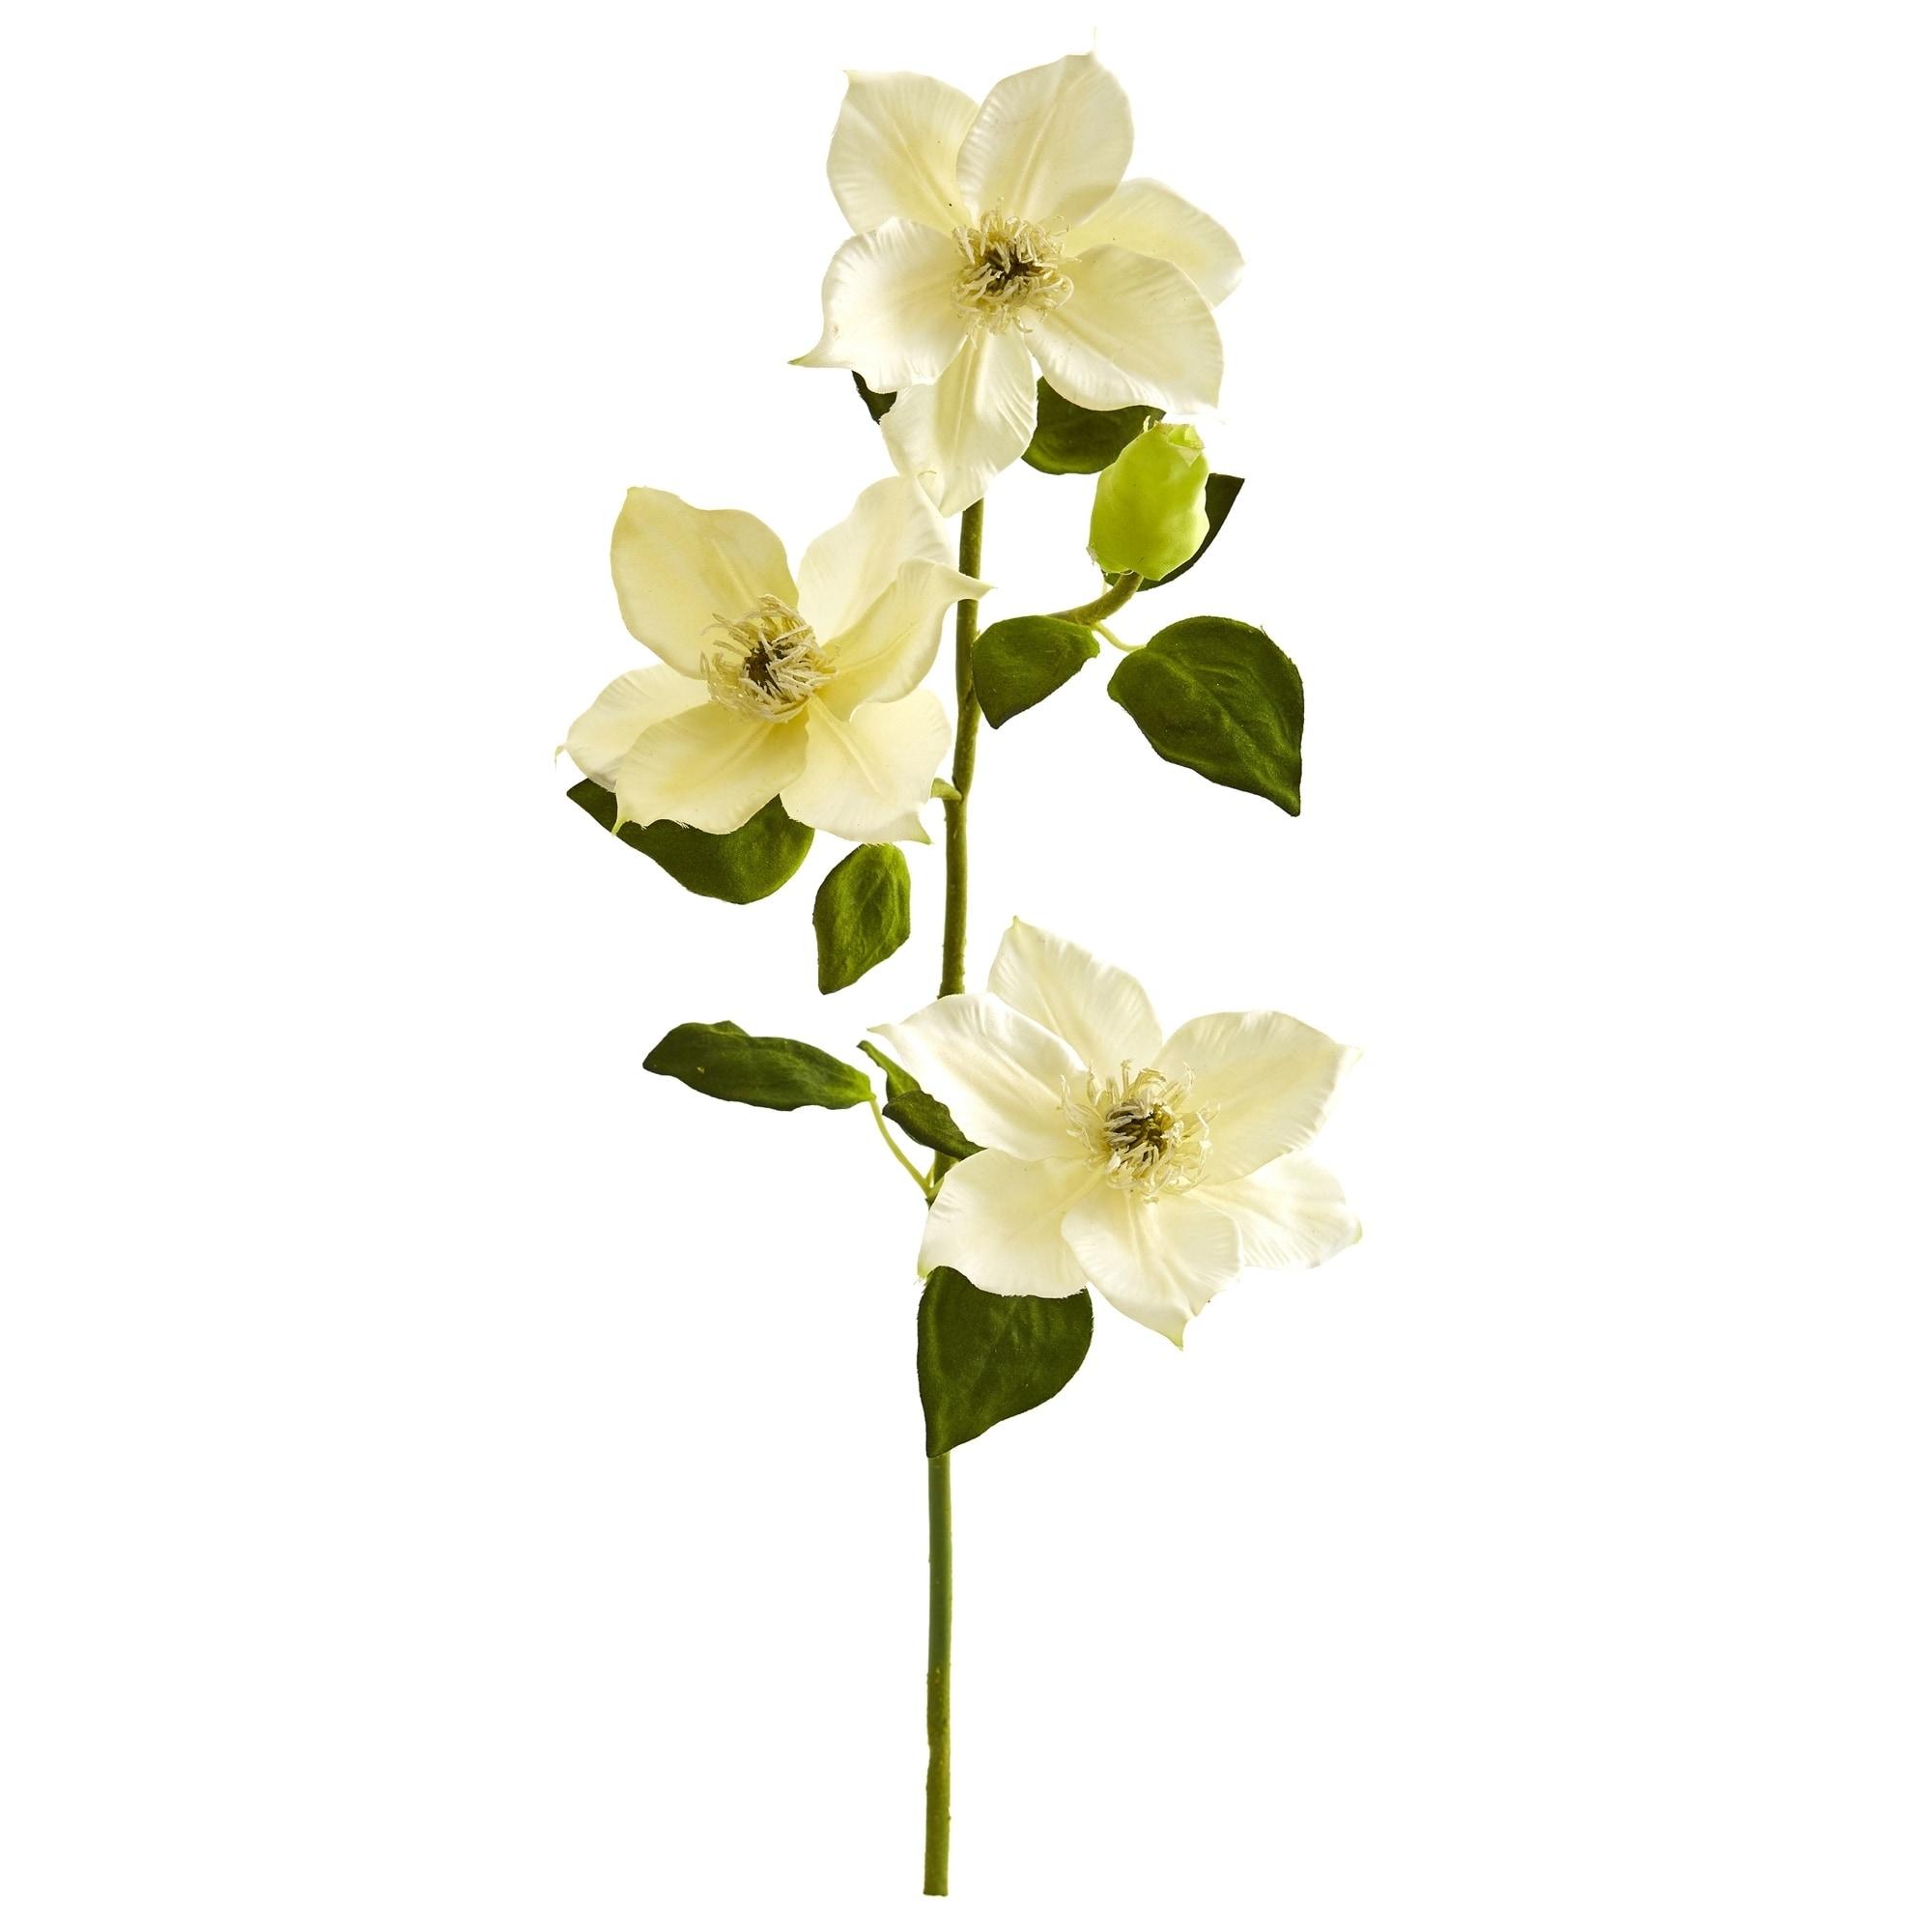 20 Artificial Flower Spray (Set of 6)